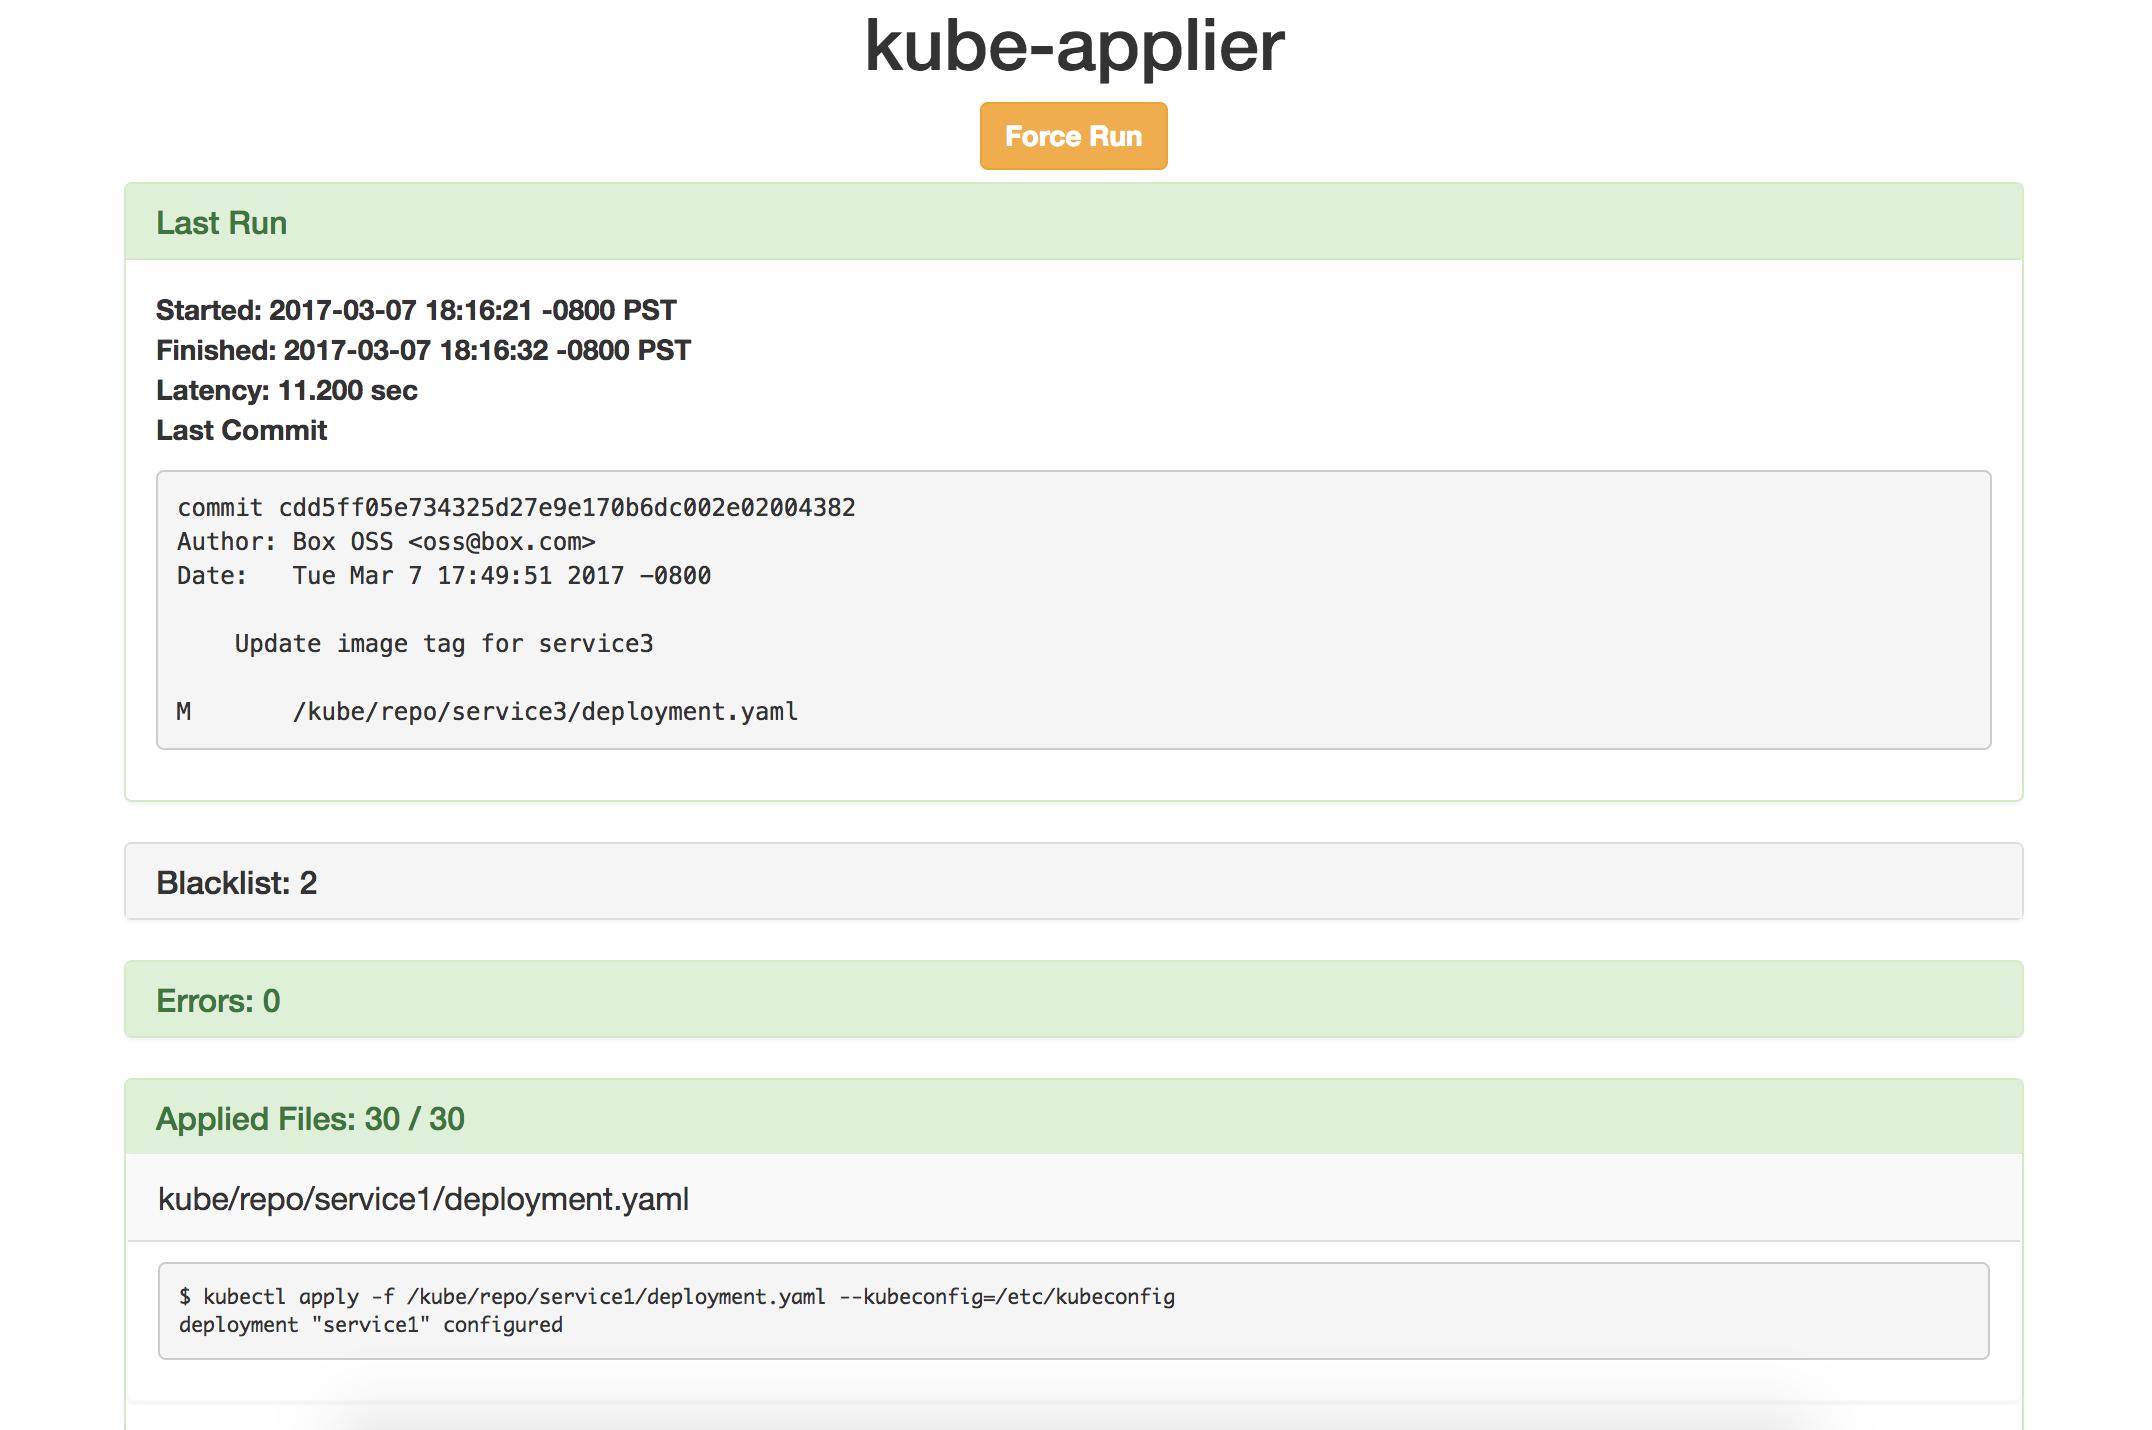 Kube-applier's web UI